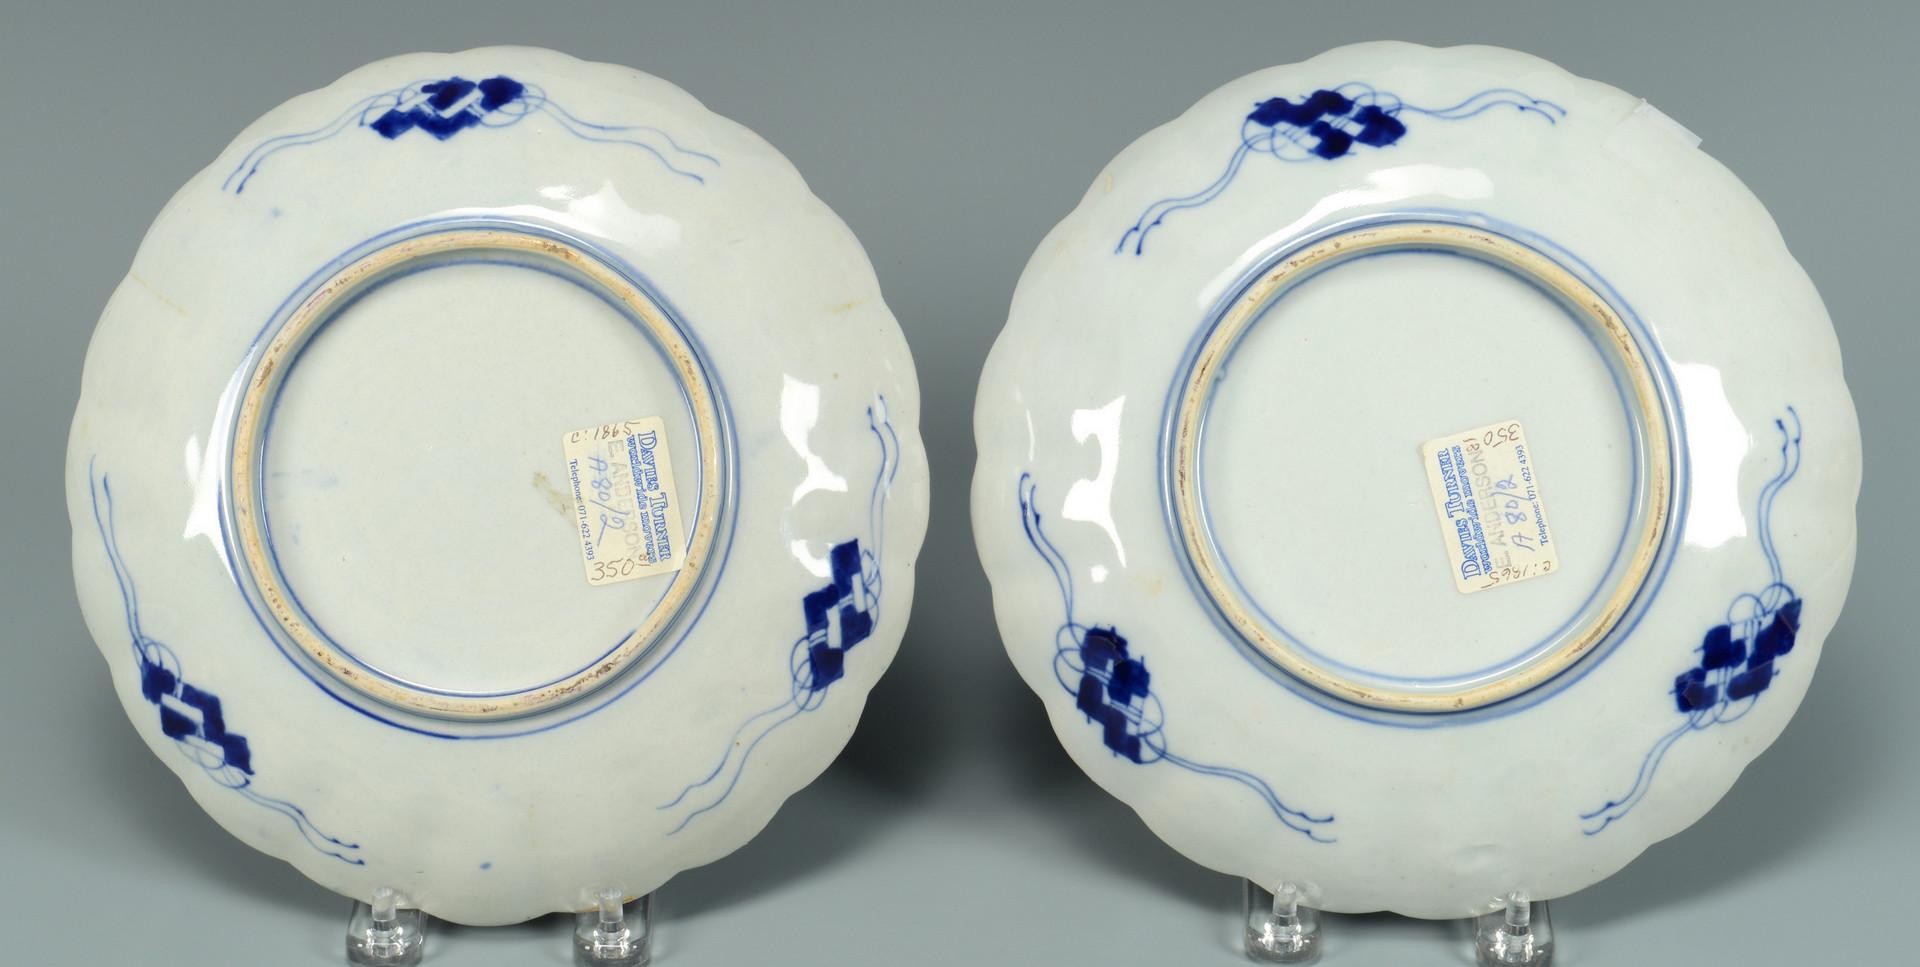 Lot 229: 4 Japanese Imari Porcelain Items